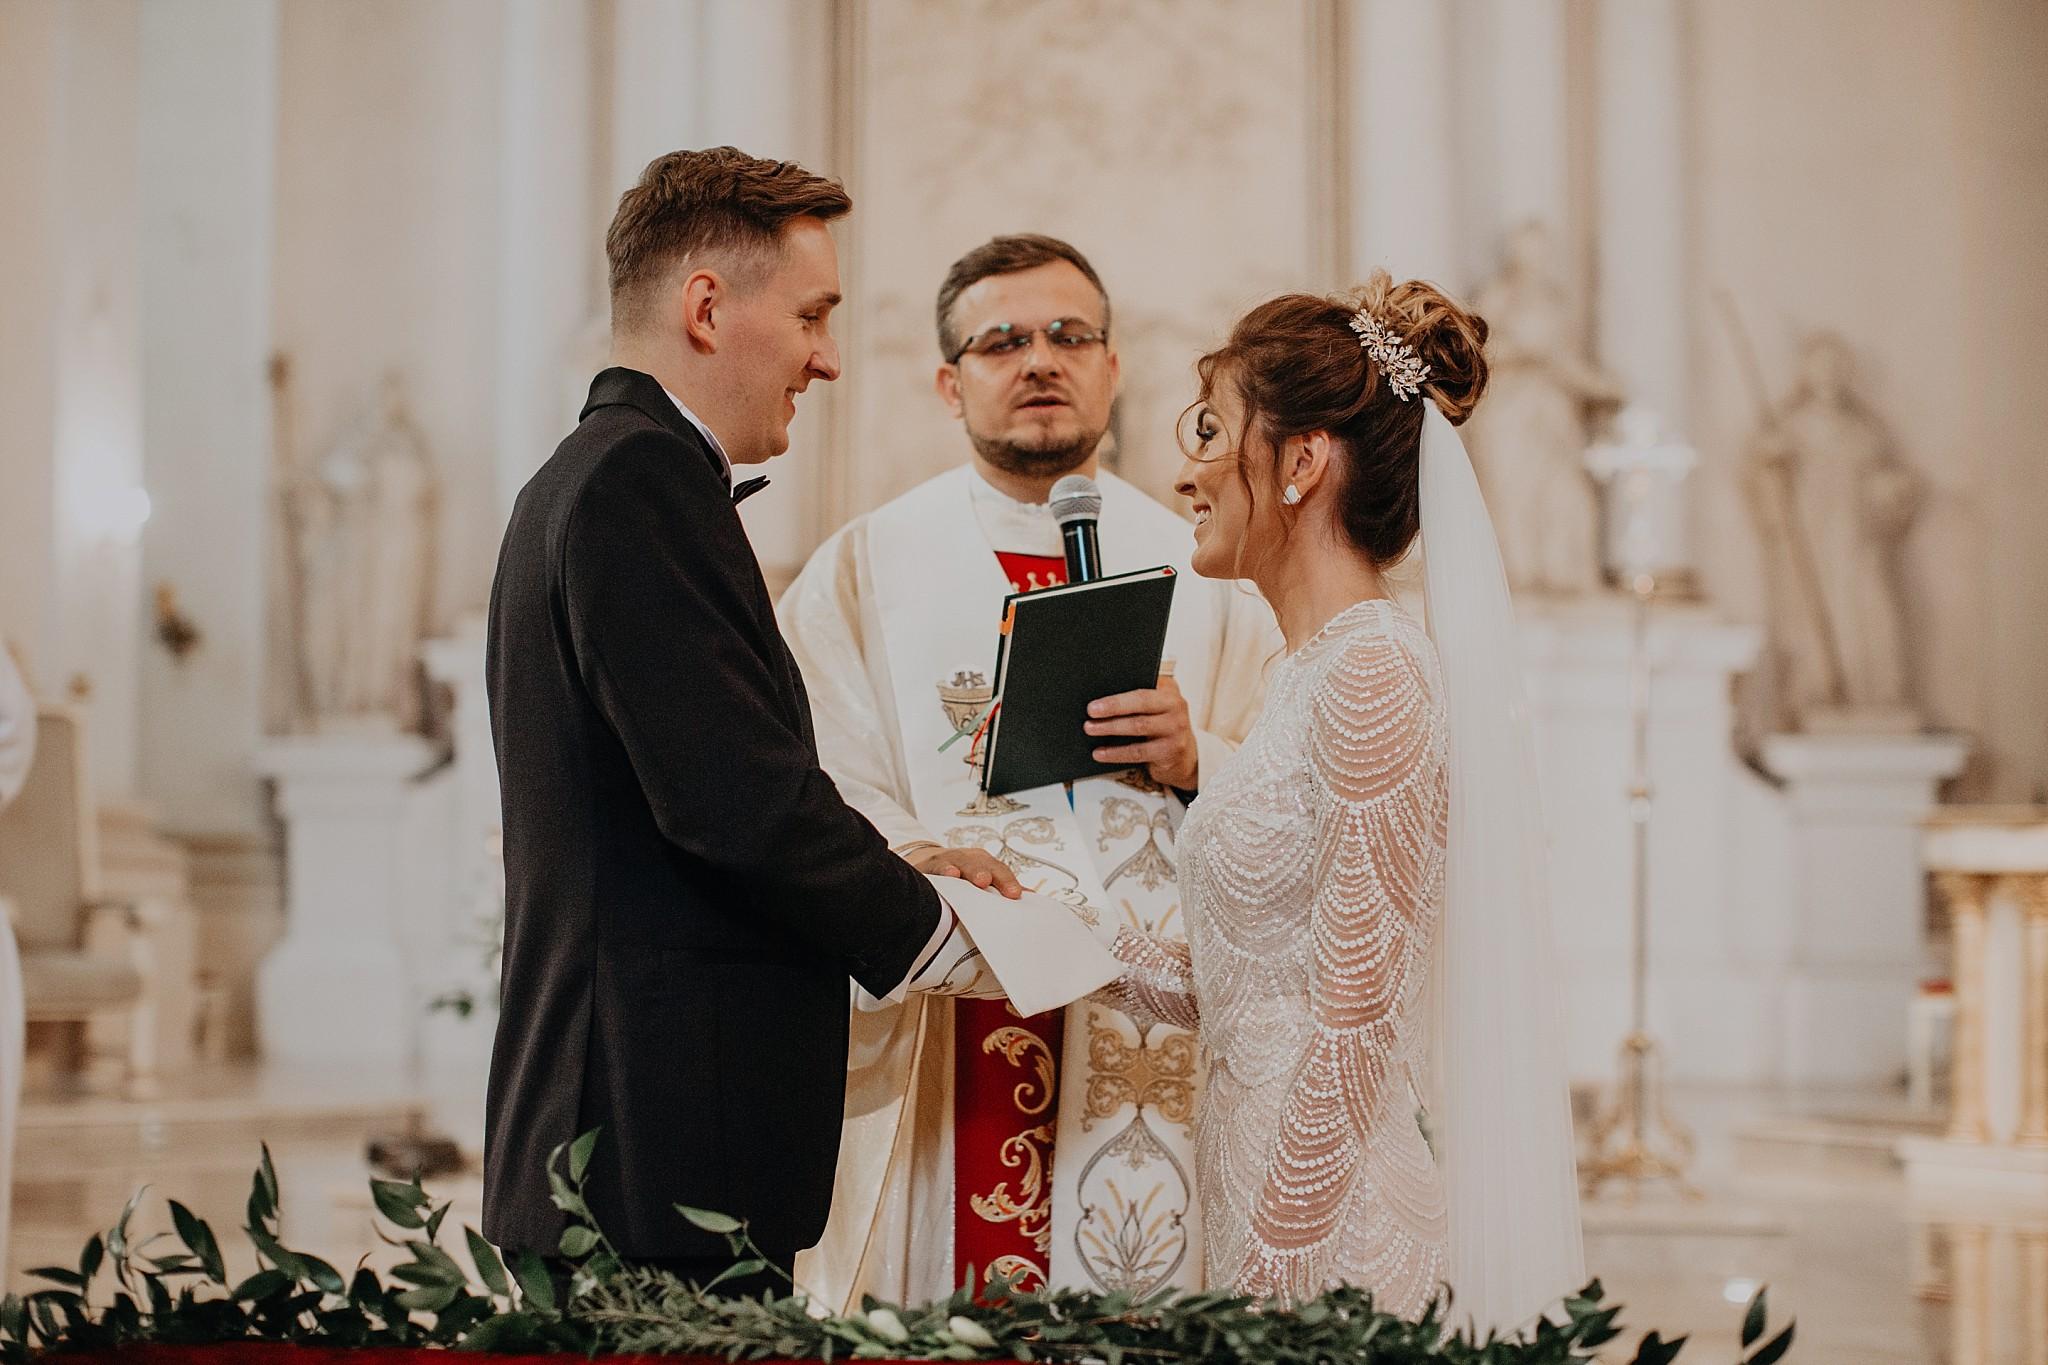 fotograf poznan wesele dobra truskawka piekne wesele pod poznaniem wesele w dobrej truskawce piekna para mloda slub marzen slub koronawirus slub listopad wesele koronawirus 175